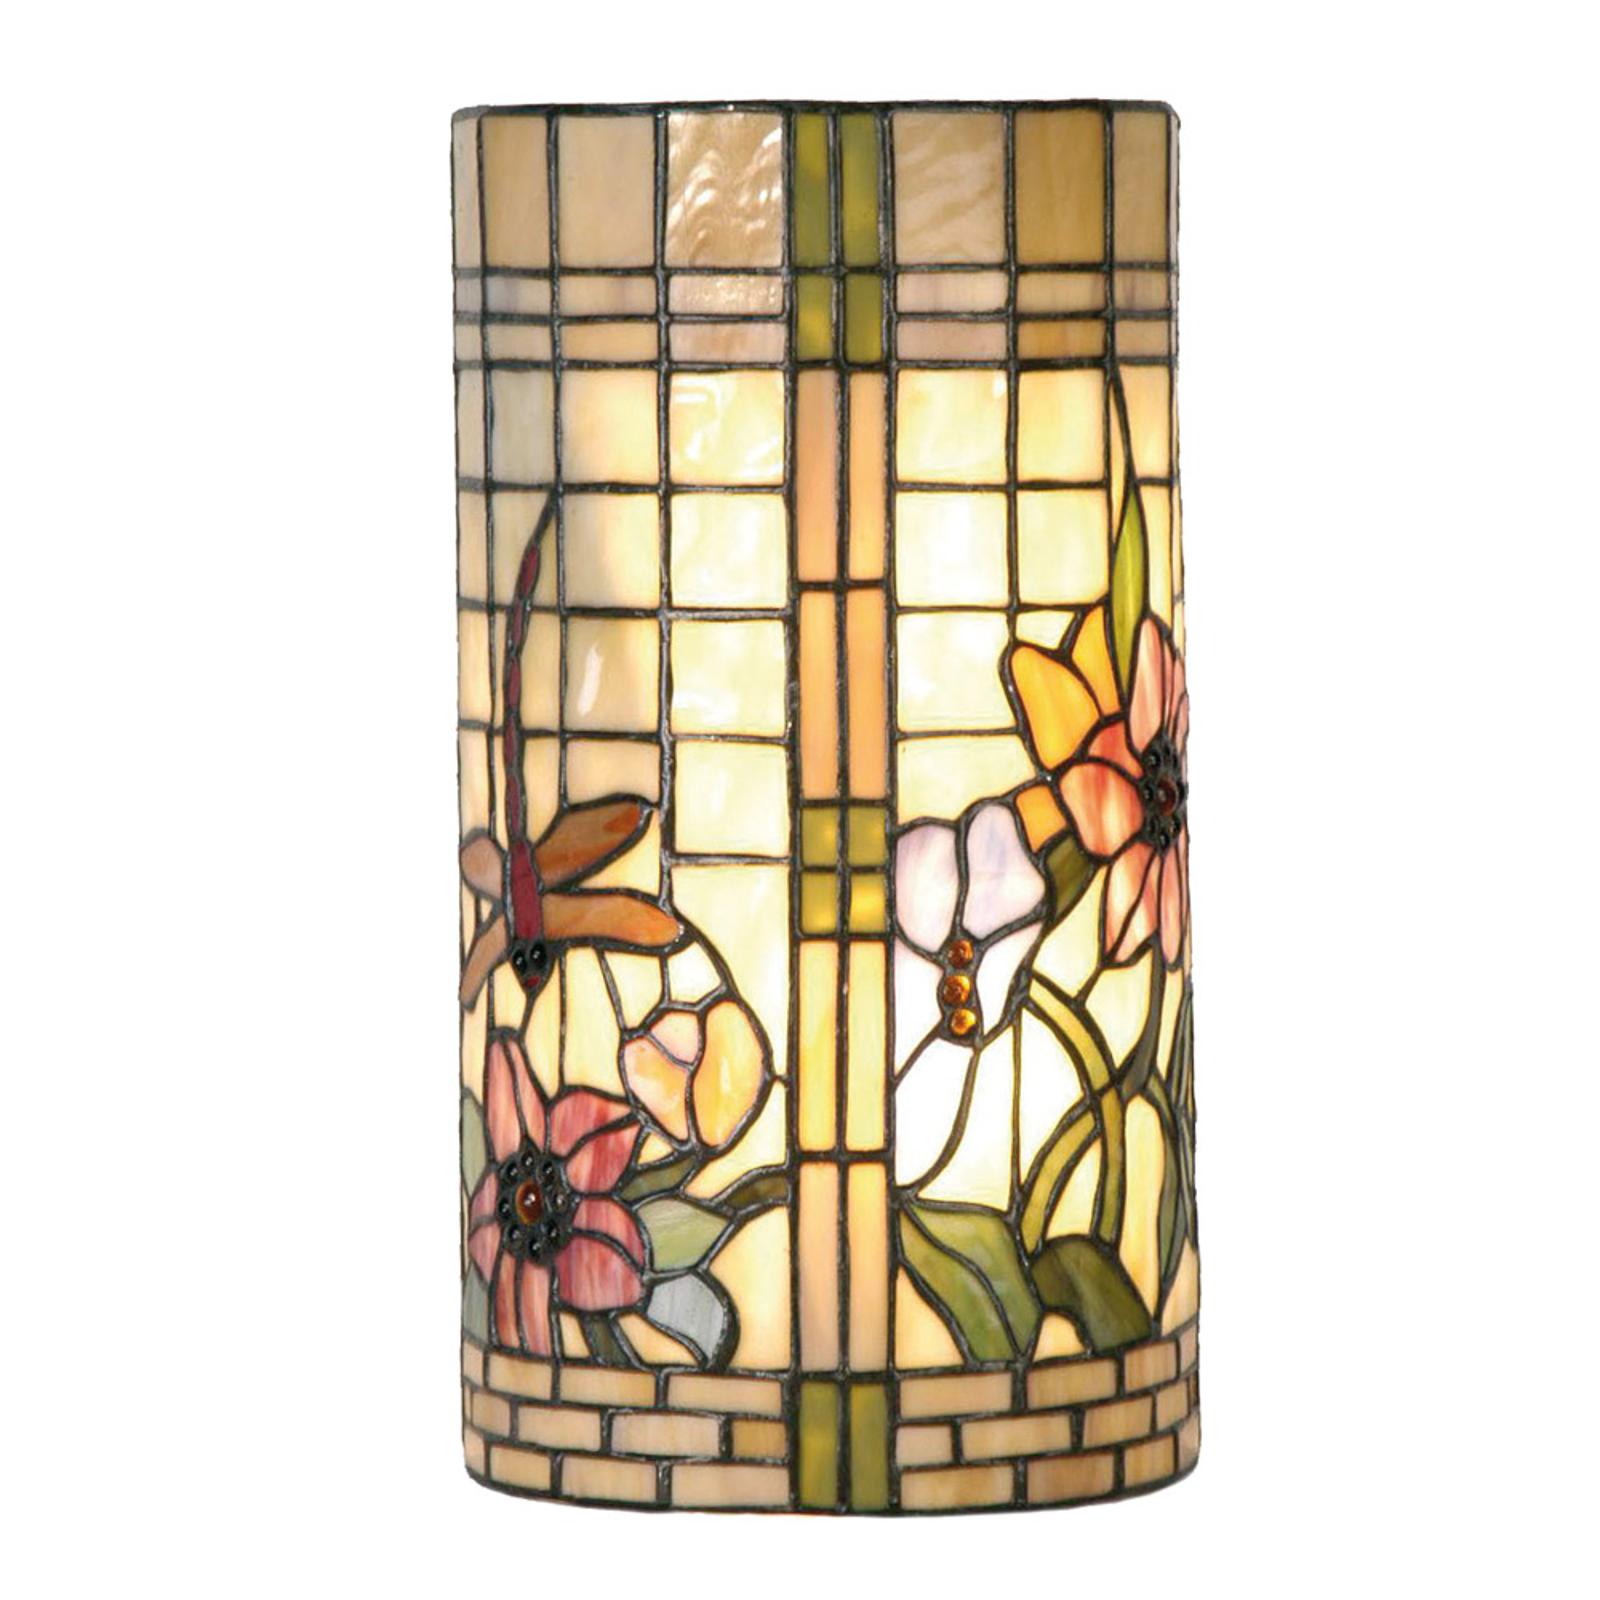 Lampada da parete floreale Hannah in stile Tiffany